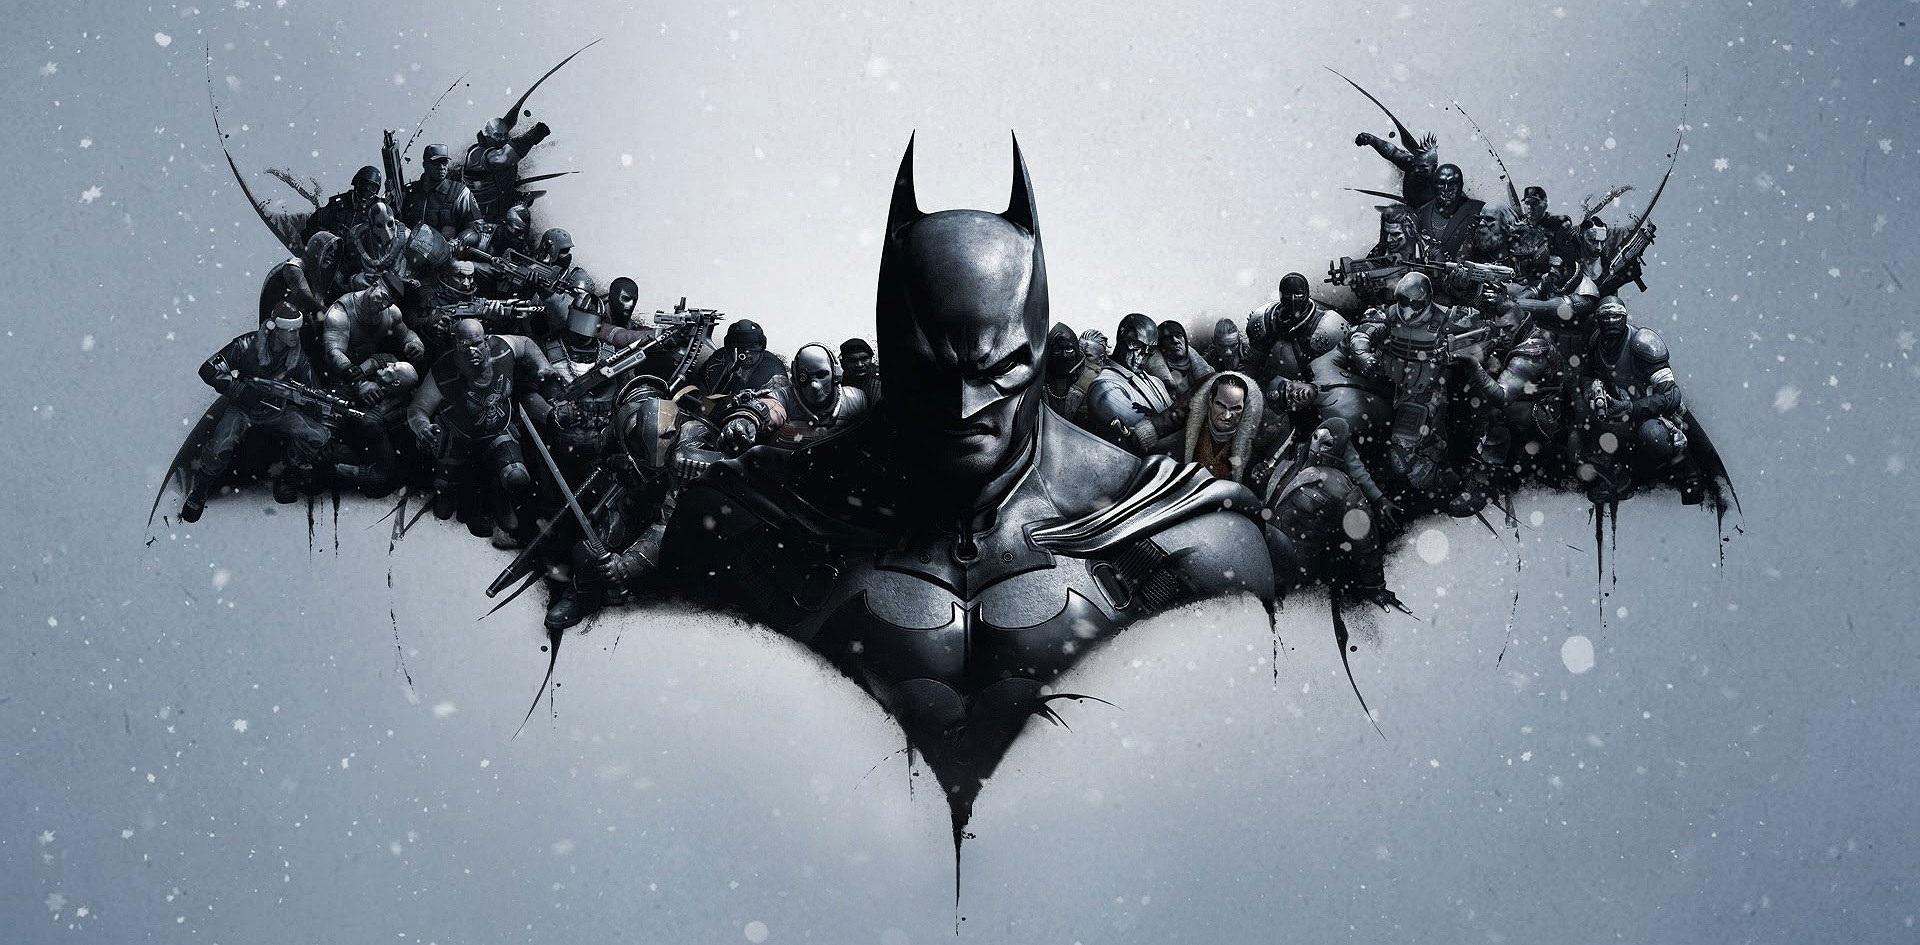 Release Date for Batman: Return to Arkham